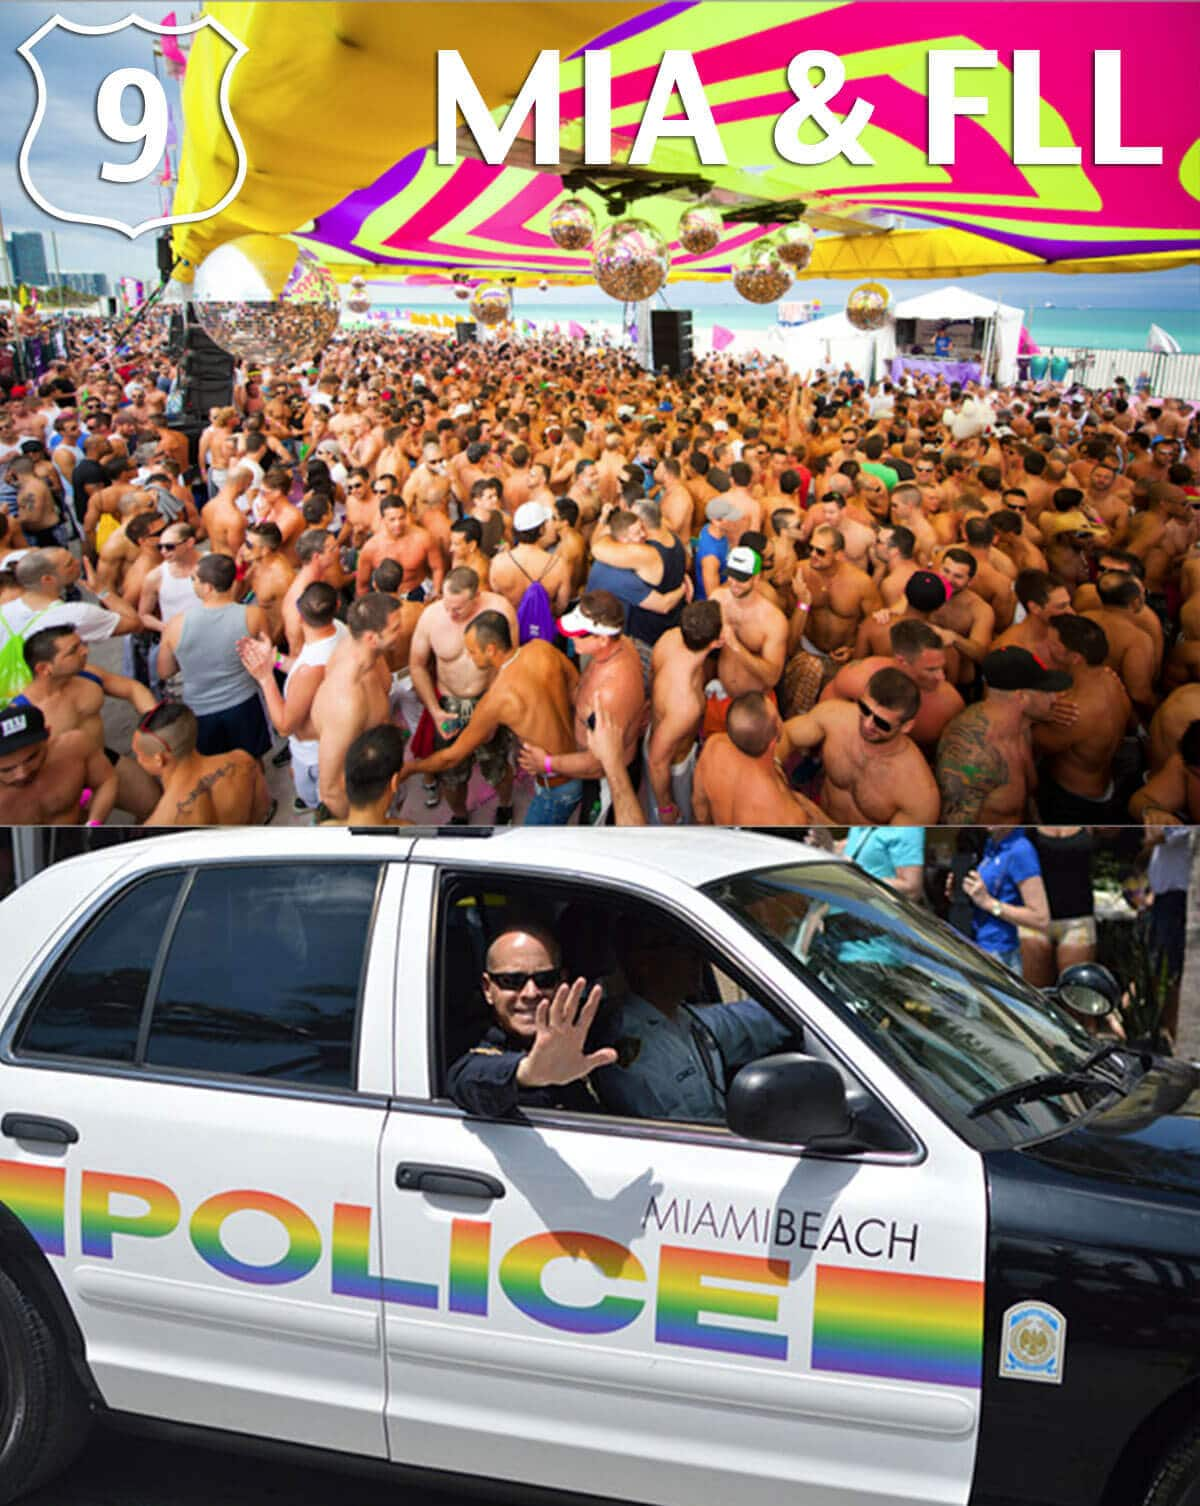 Top 10 Gay Destinations 2015 Miami Fort Lauderdale